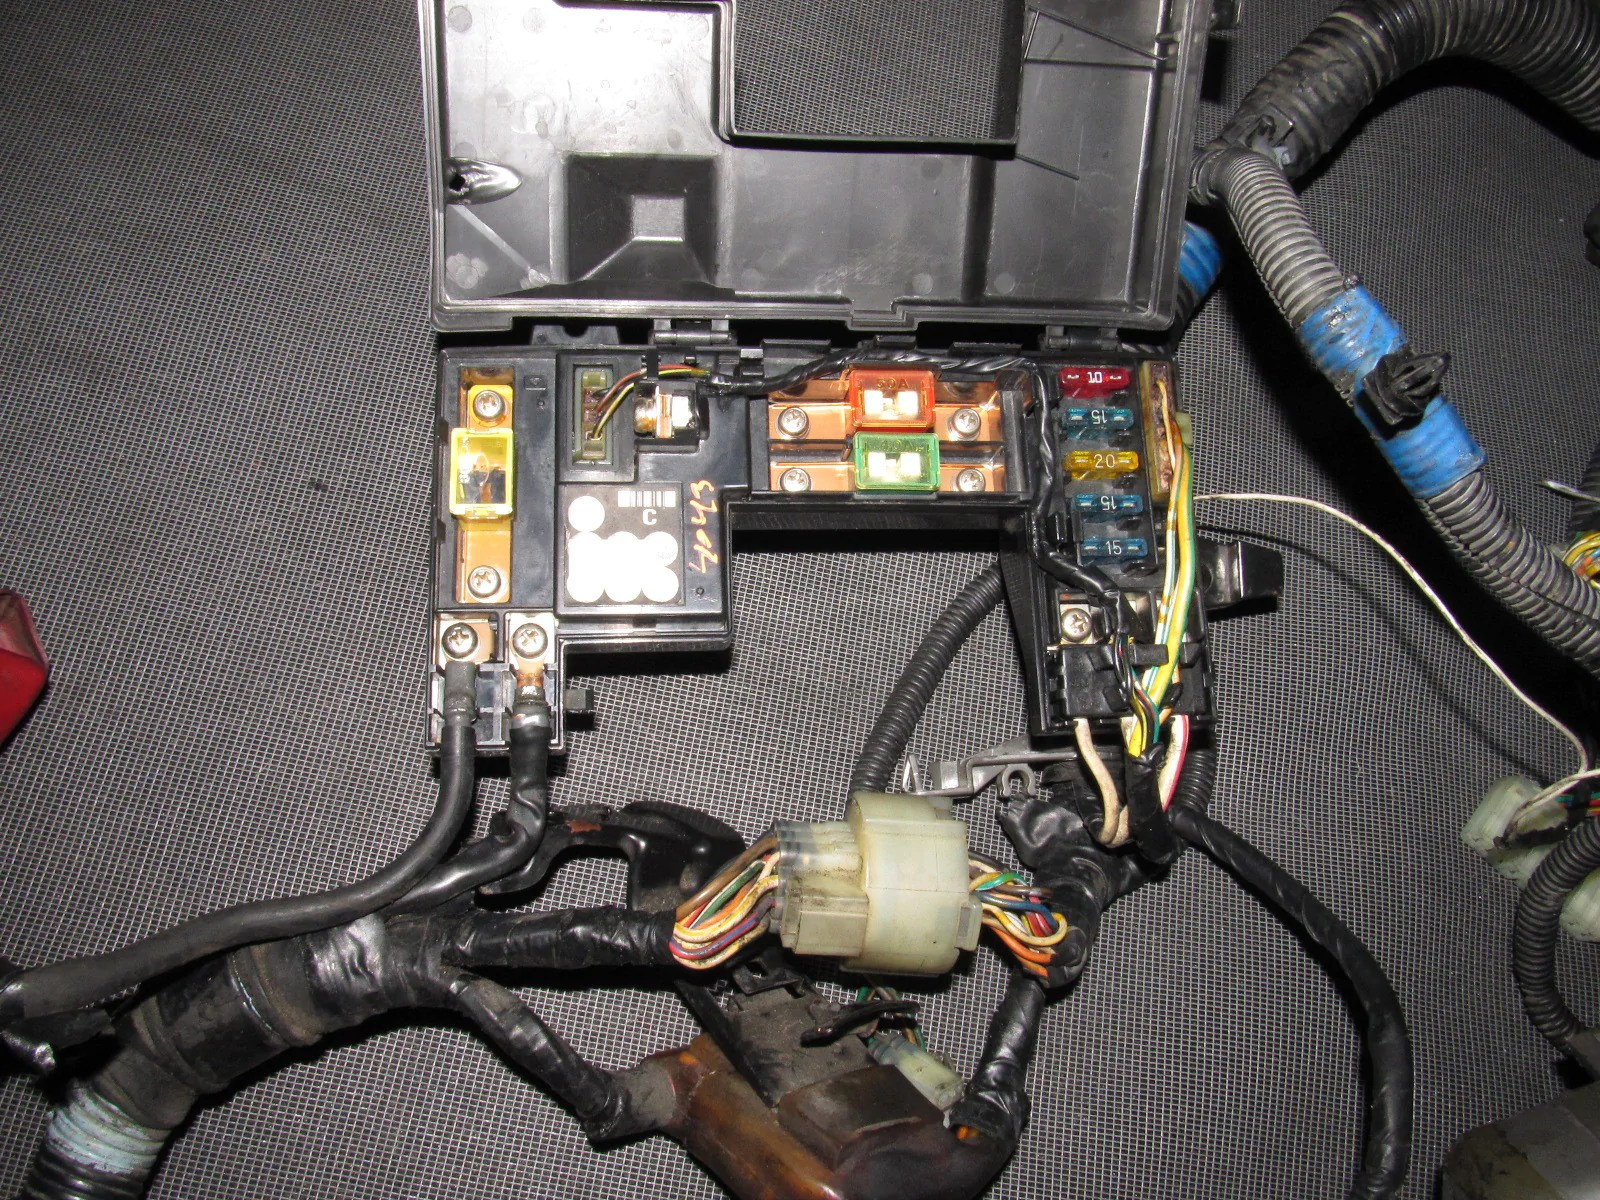 88 89 honda crx oem d15b2 engine wiring harness  [ 1600 x 1200 Pixel ]